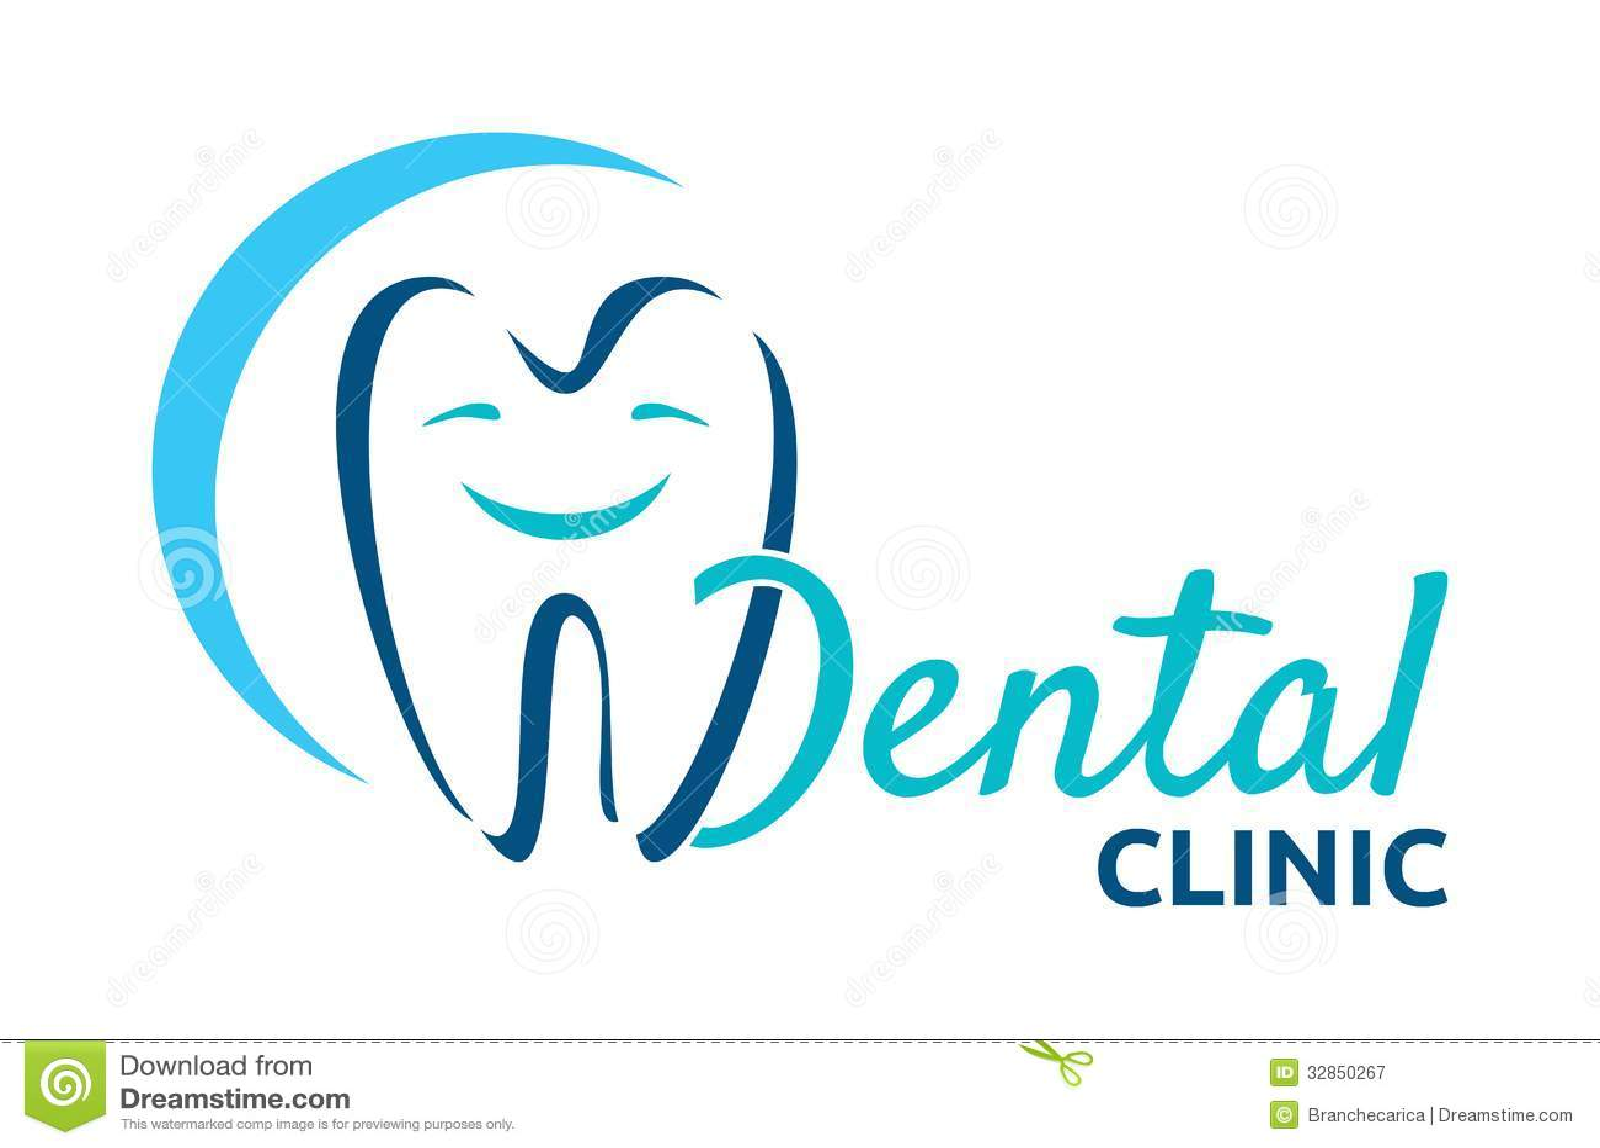 Dental Icon Stock Vector Illustration Of Clinical Element 32850267 Rh Dreamstime Com Logo Free Download